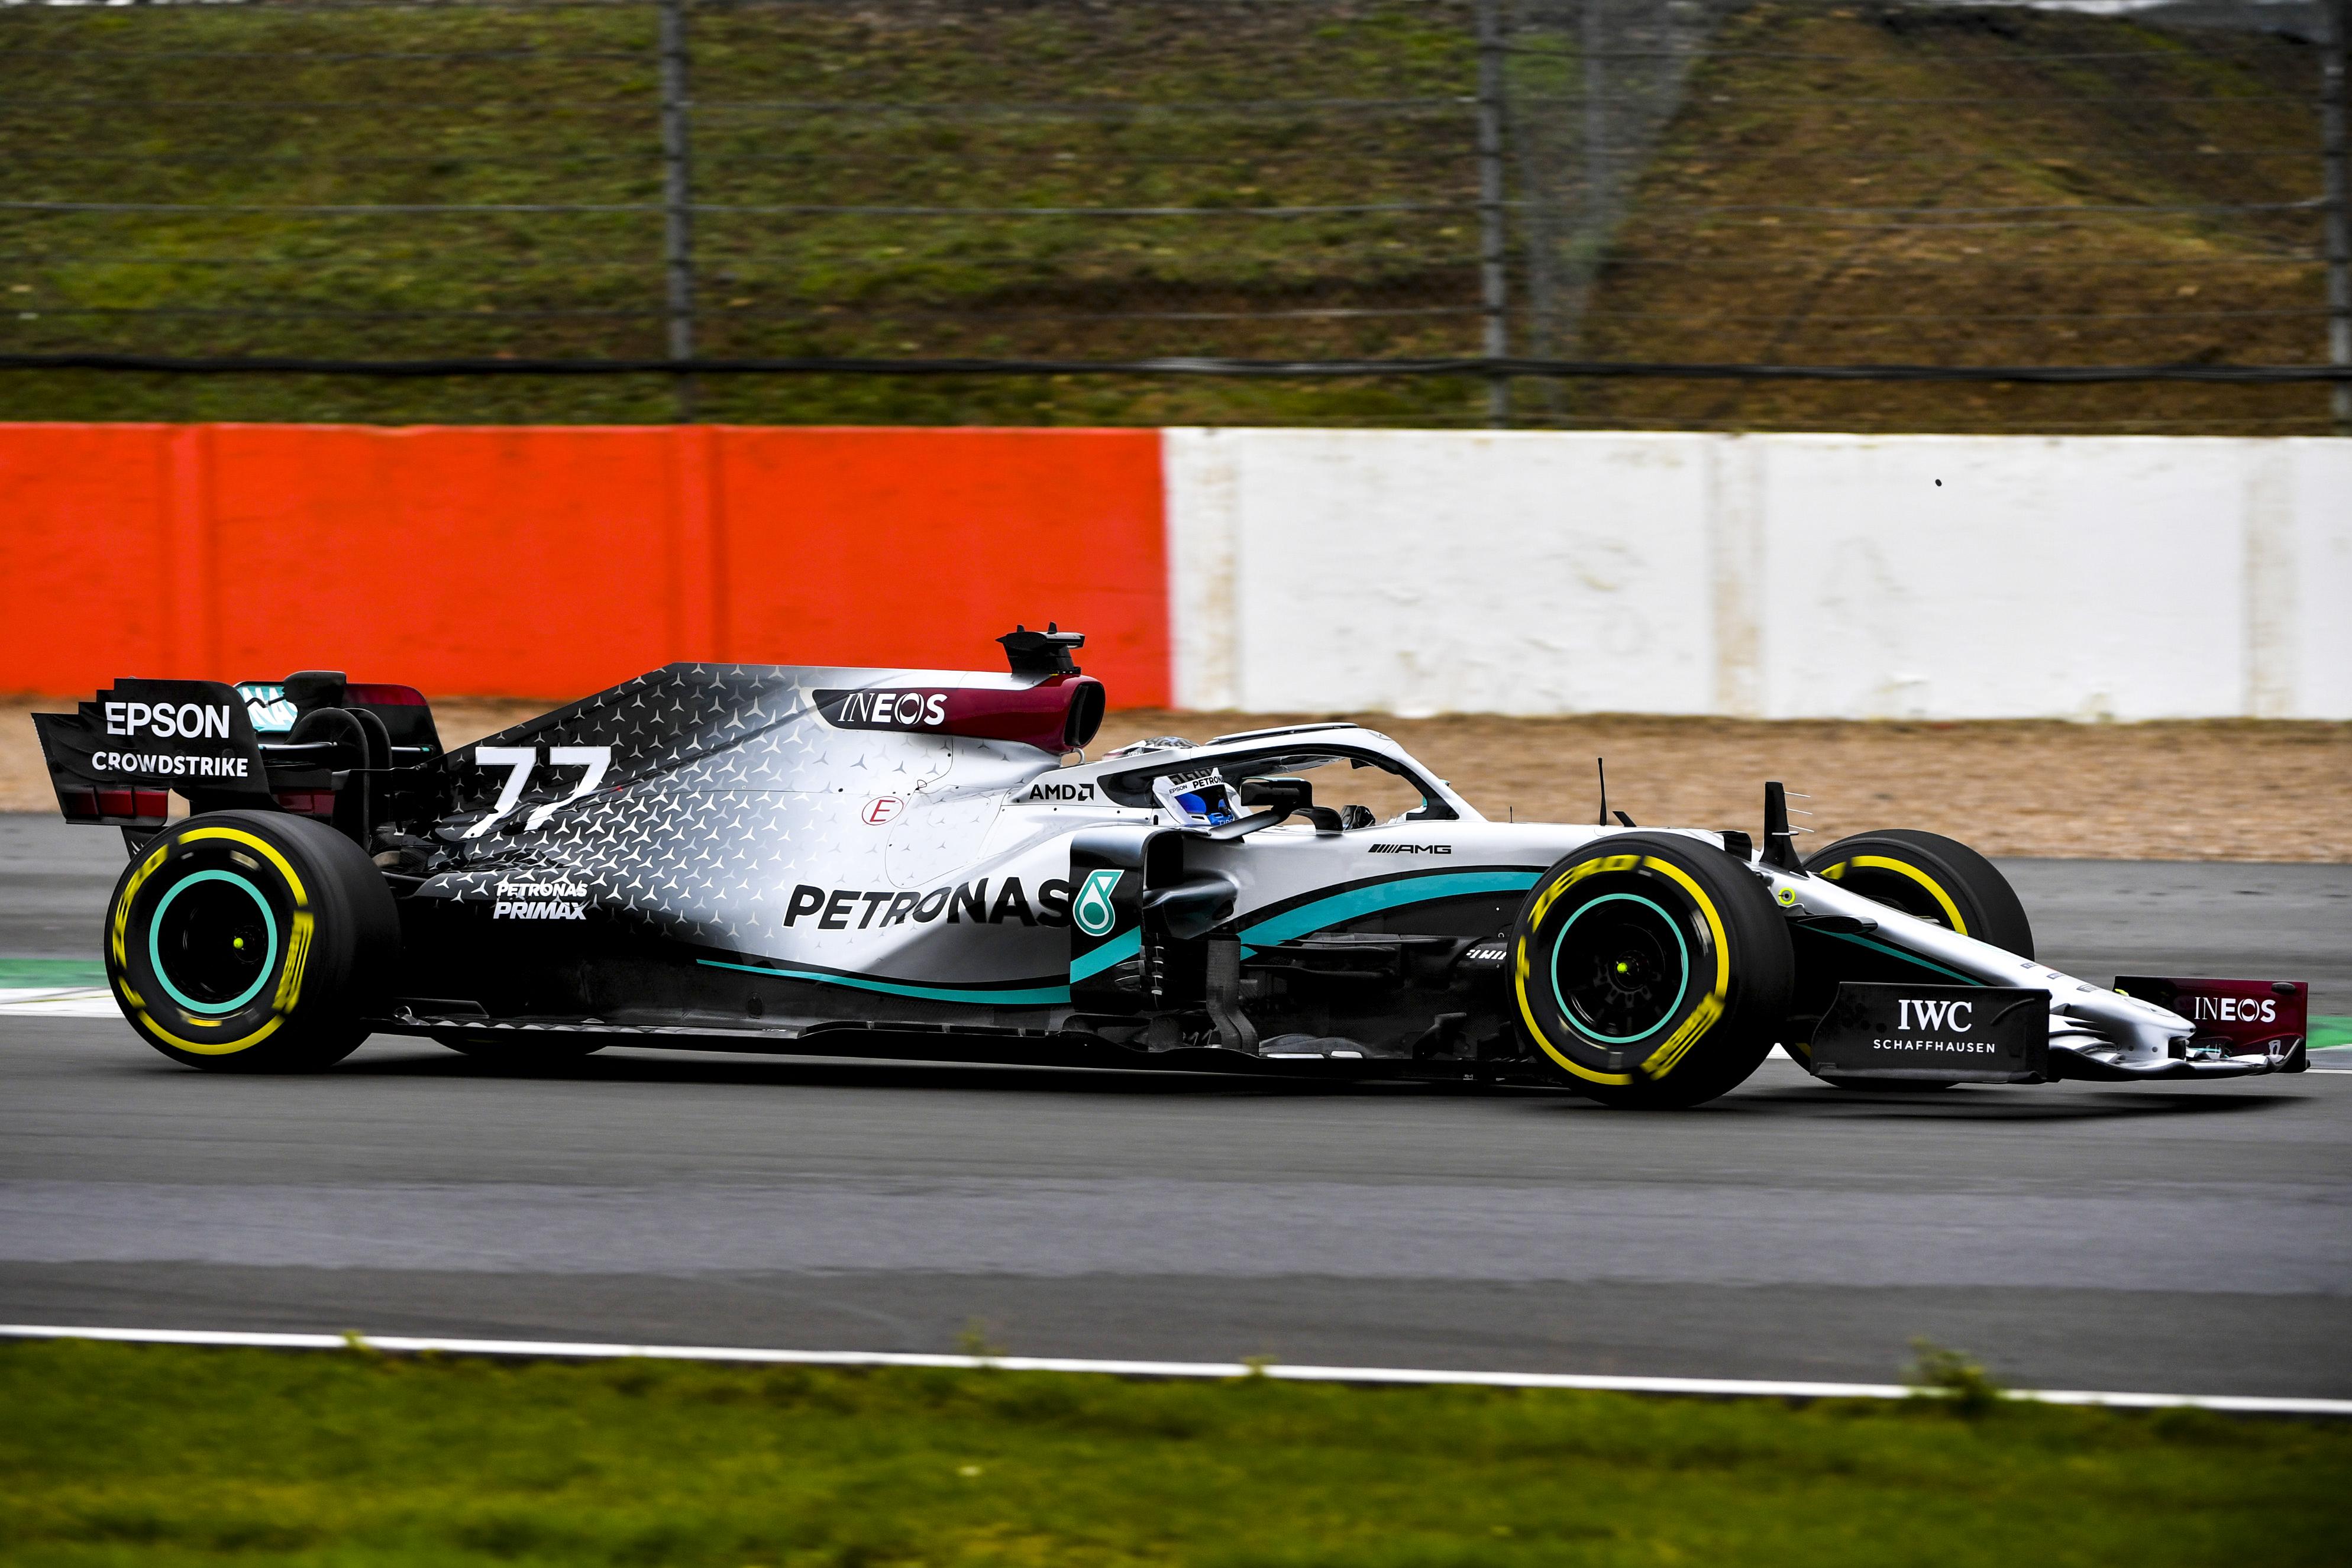 Fotó: Daimler Global Media Site